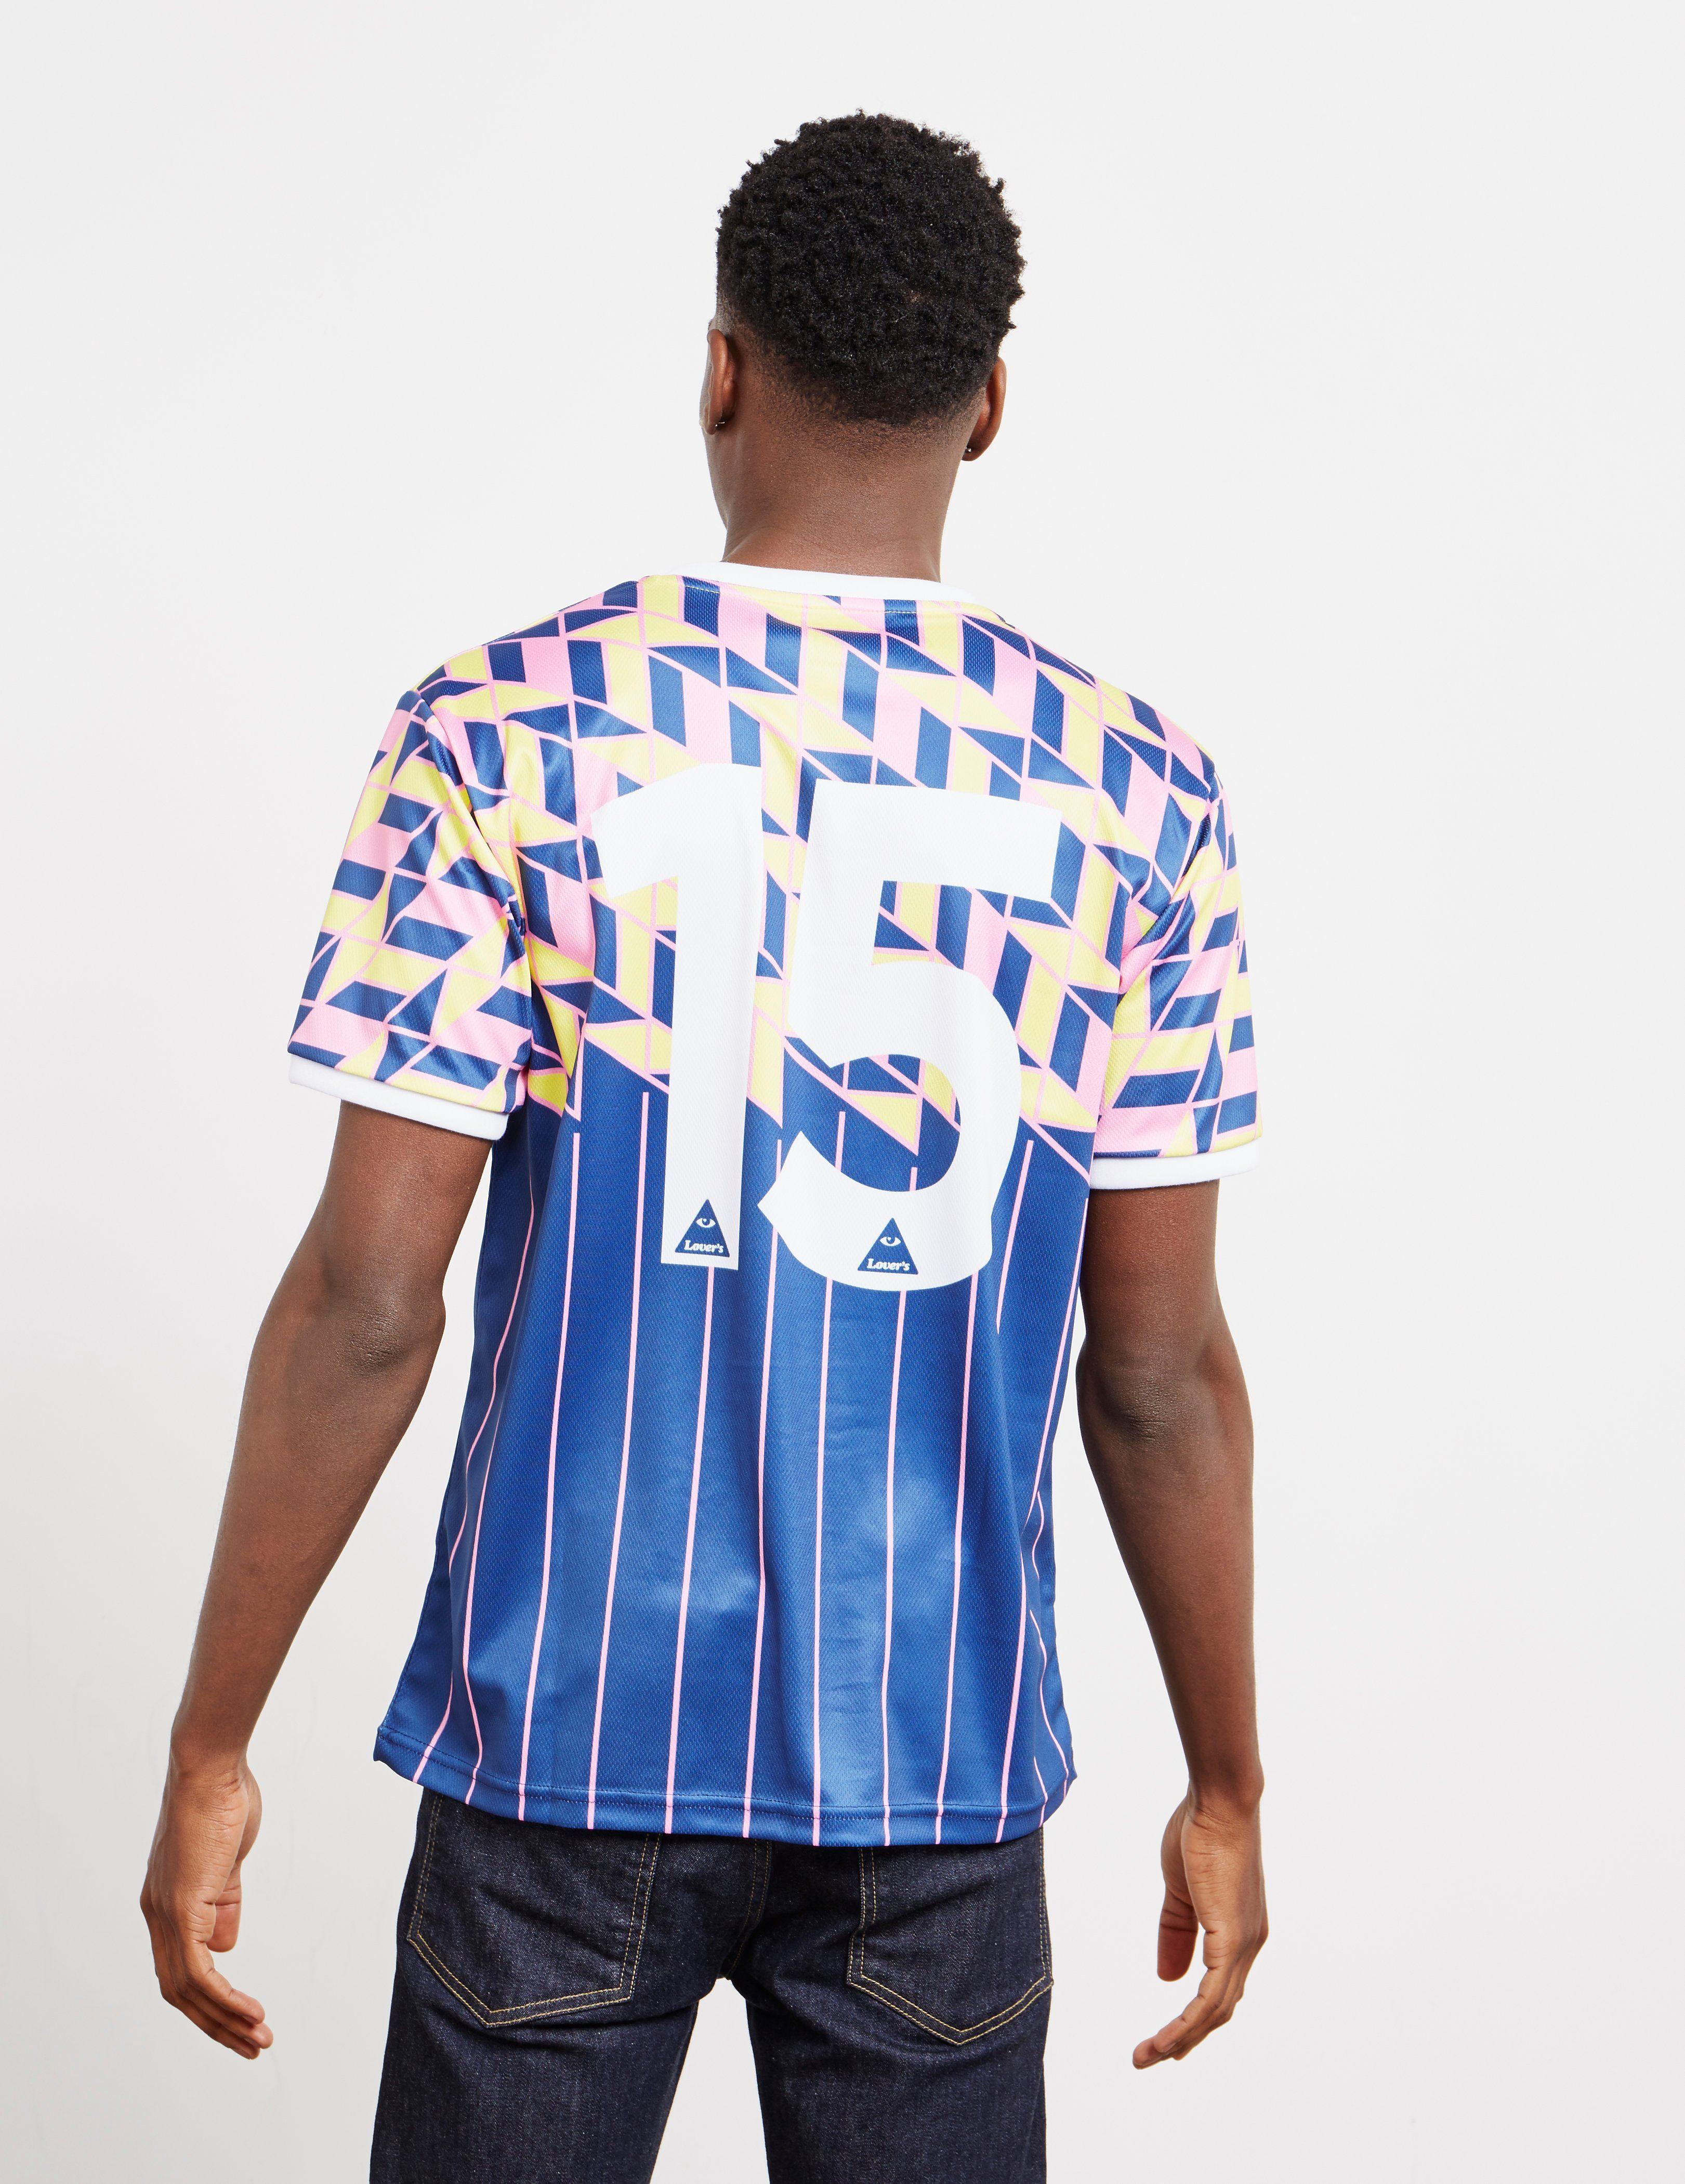 Lovers FC x Tessuti Glasgow Football T-Shirt